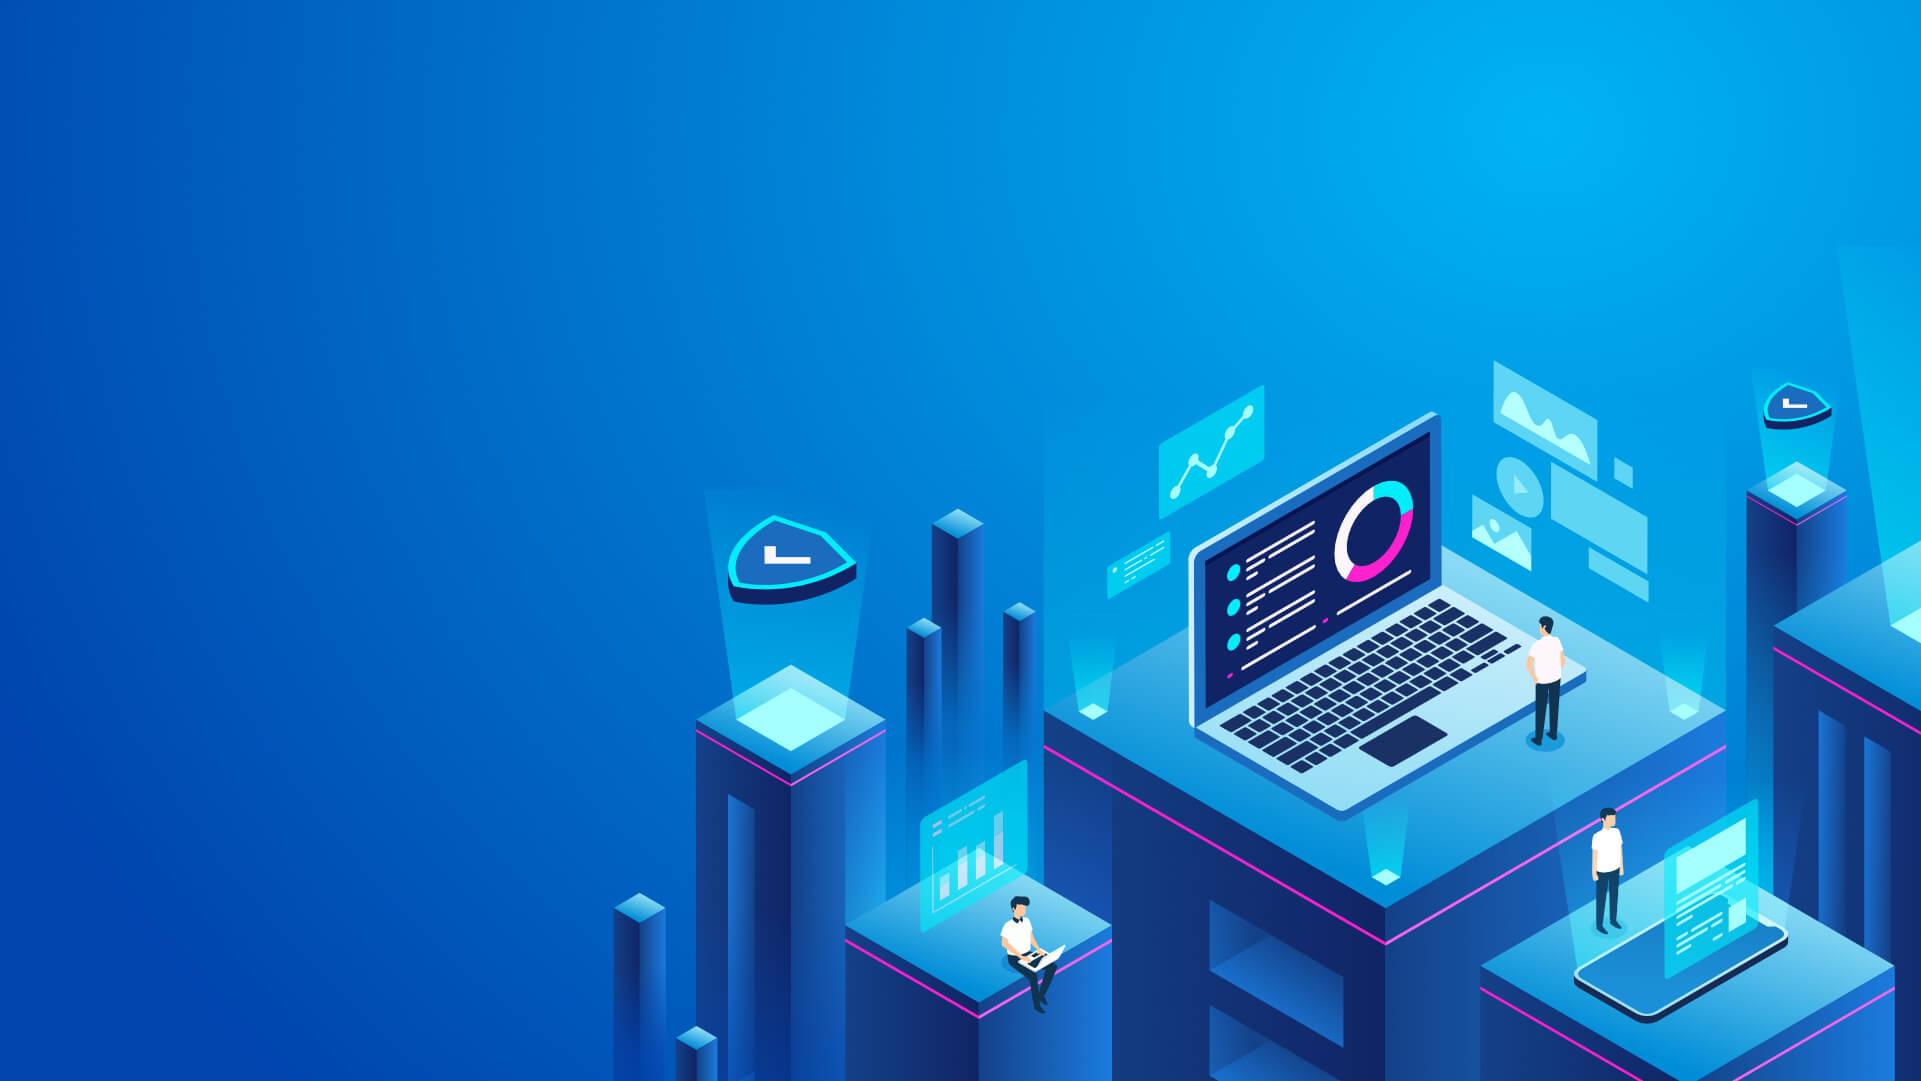 Digital Transformation Services, Digital Transformation Strategy, Business transformation